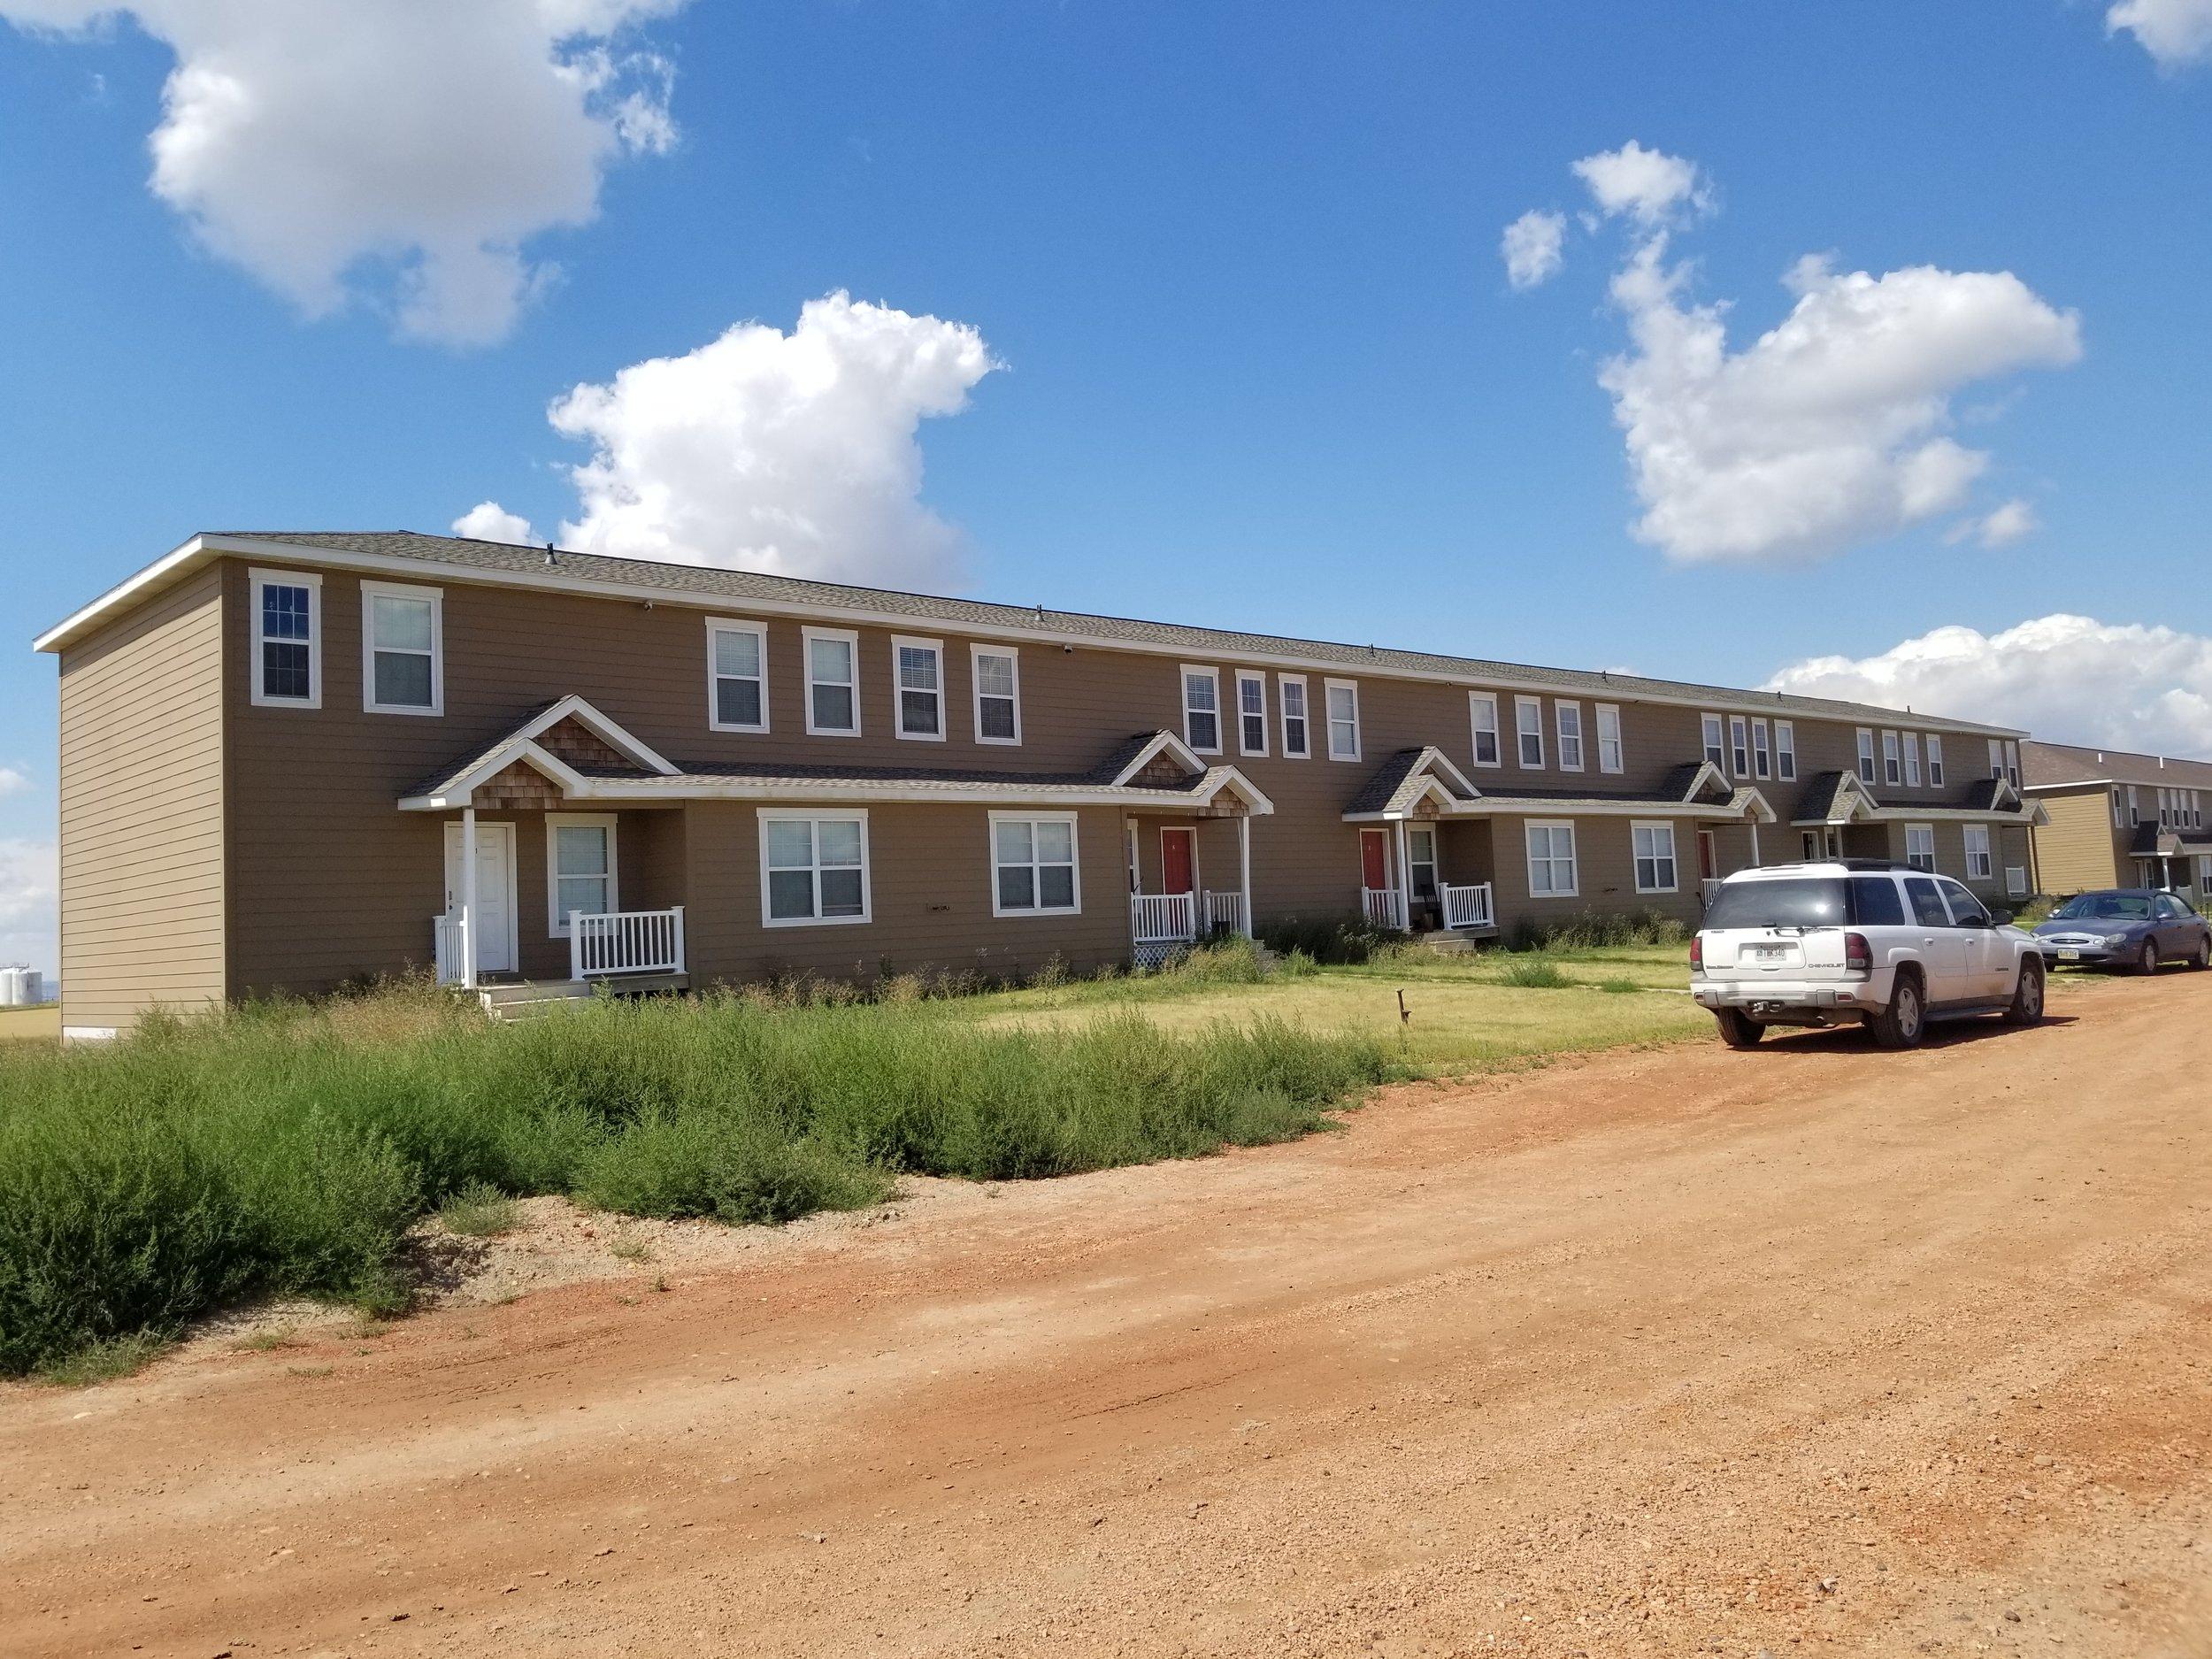 36 Unit Workforce Housing